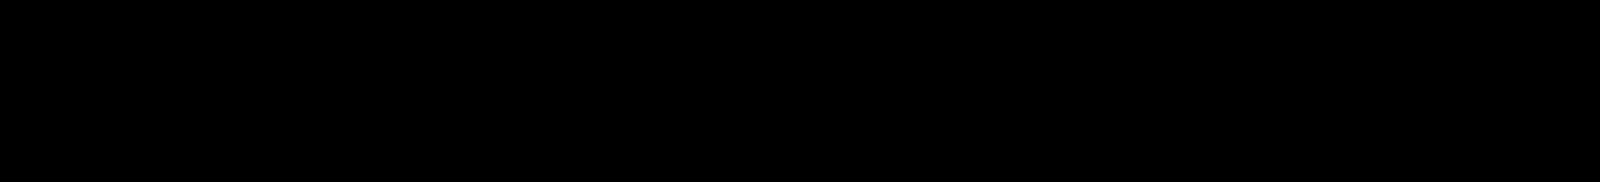 Chani Nicholas Regular Logo 1 Line